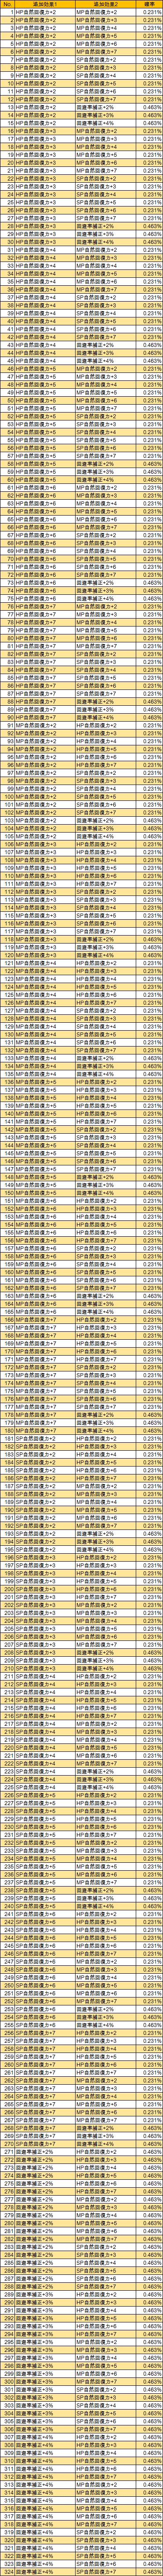 T15-2 T-敏捷(LV285)